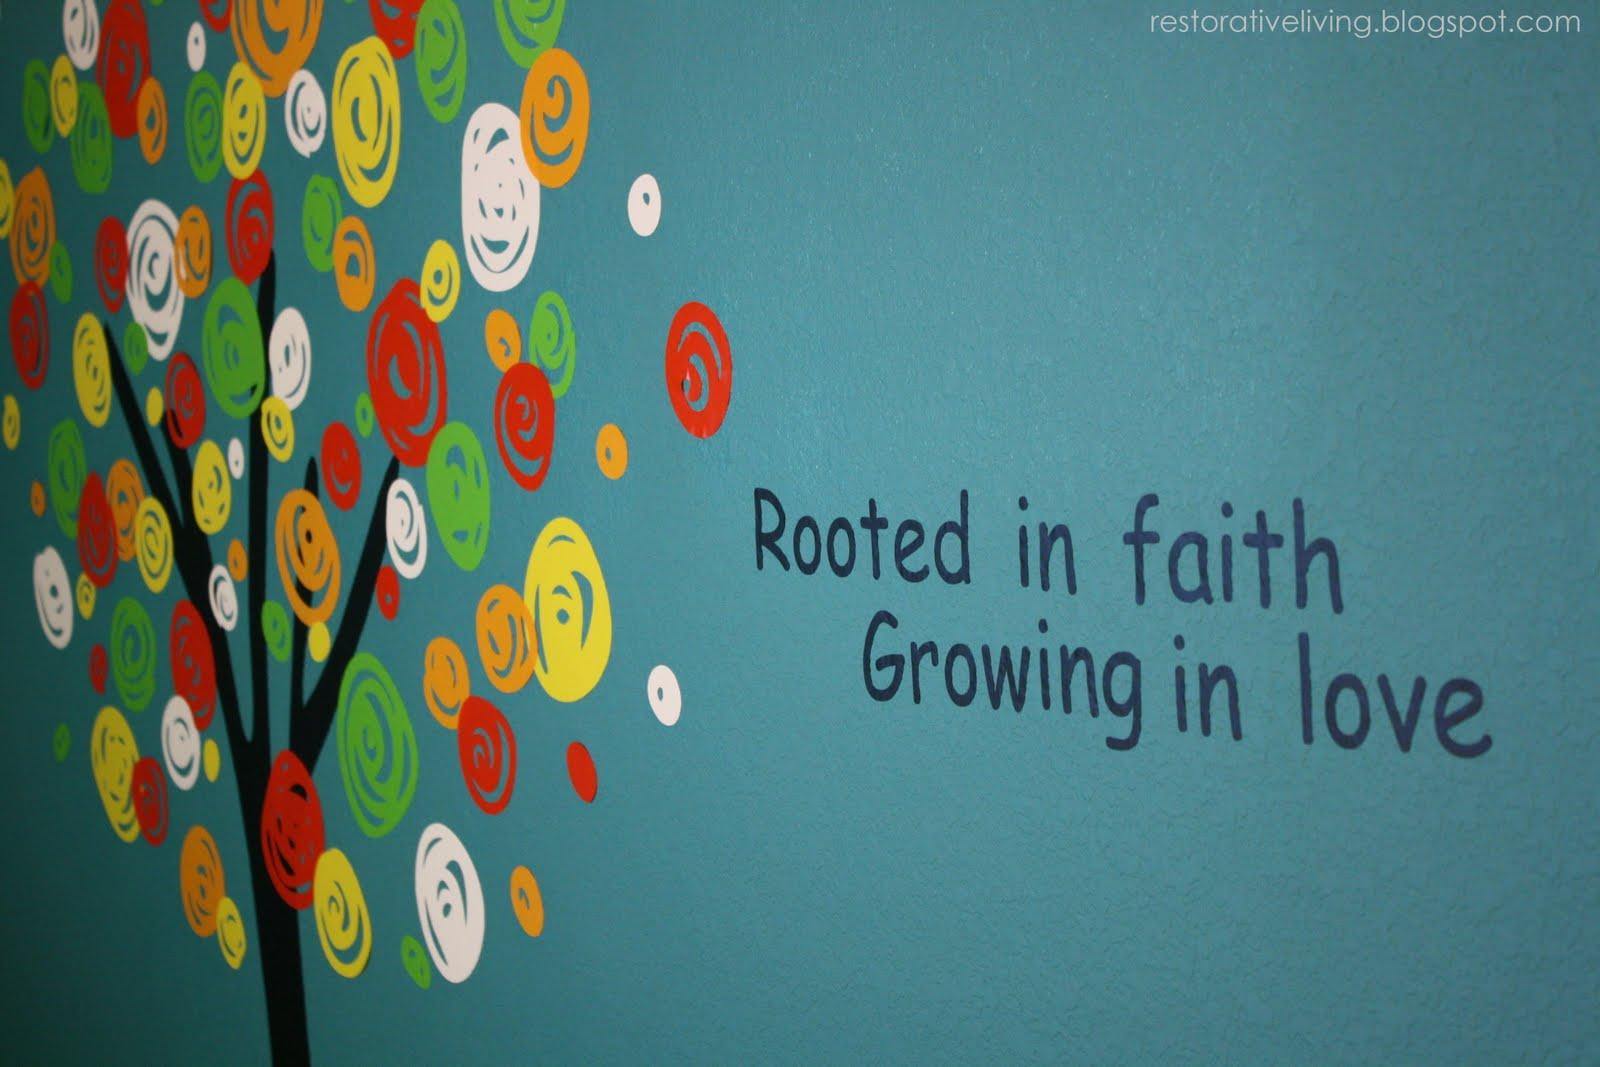 Sunday school wall murals - chefhorizon.com